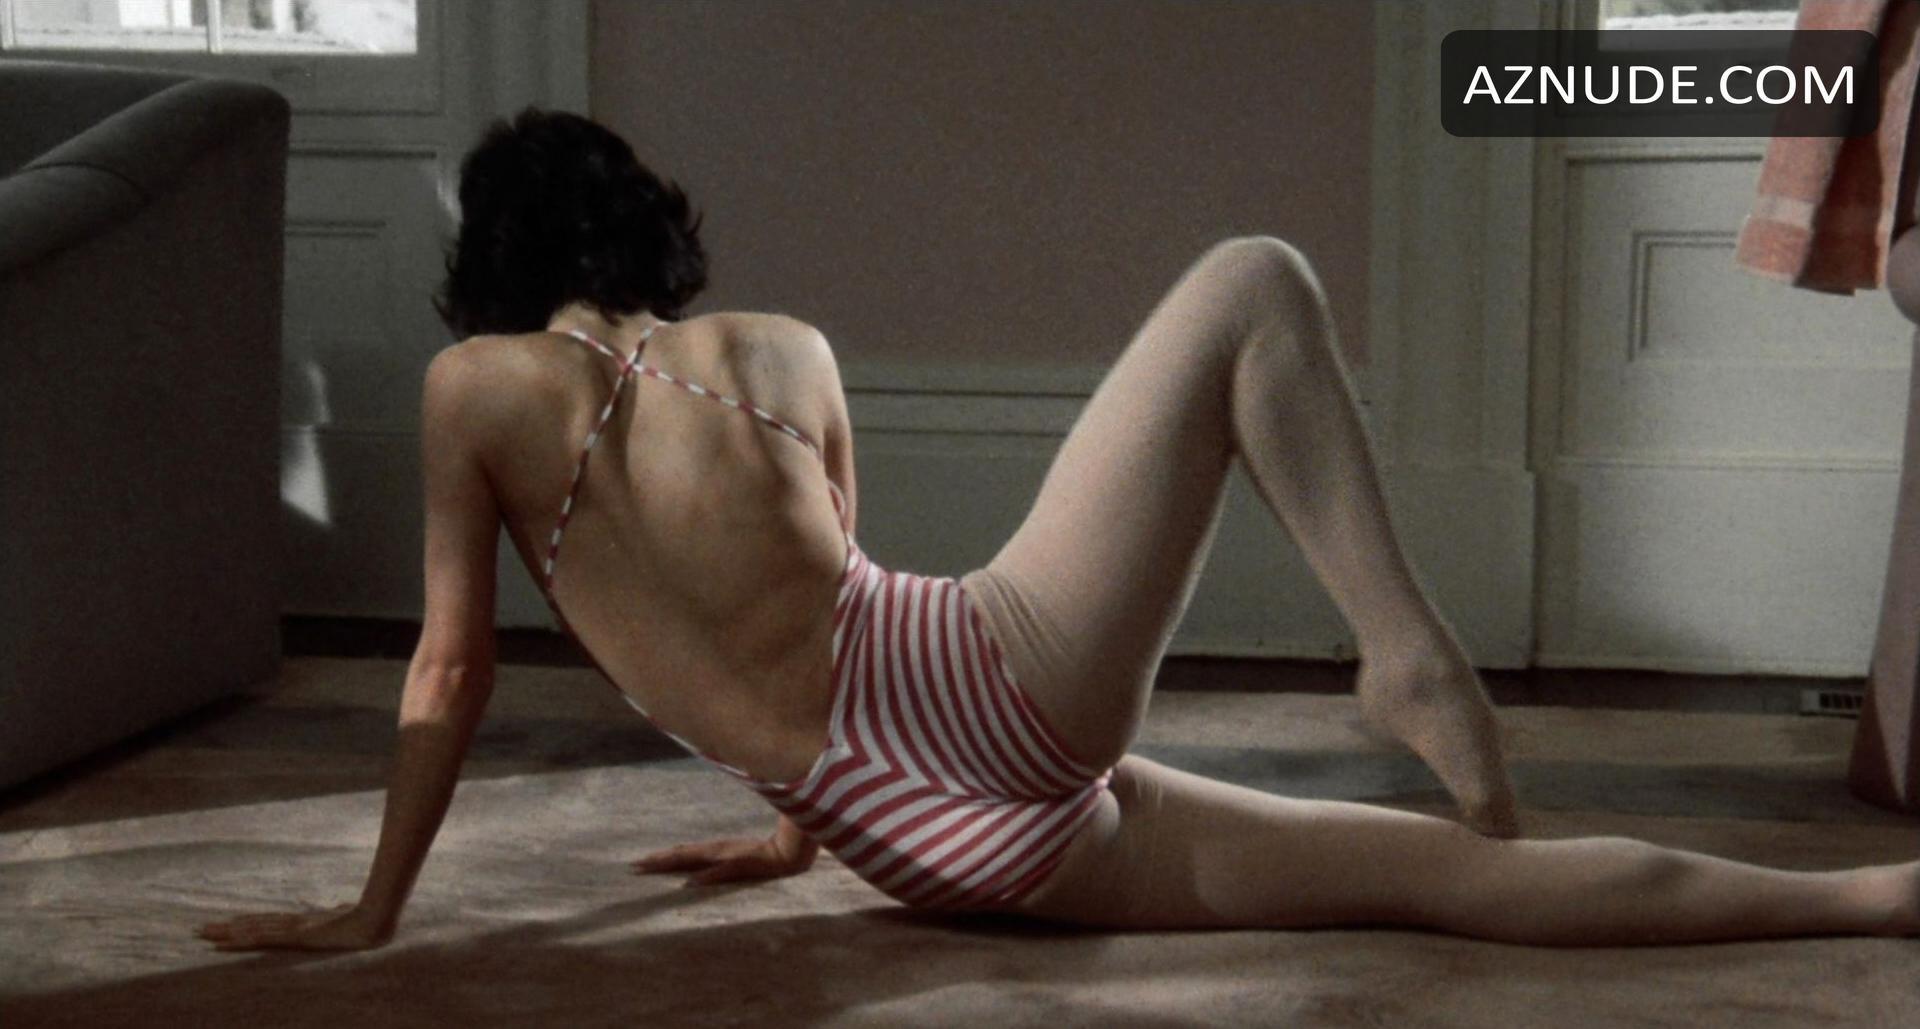 Alien fuck woman porn scenes